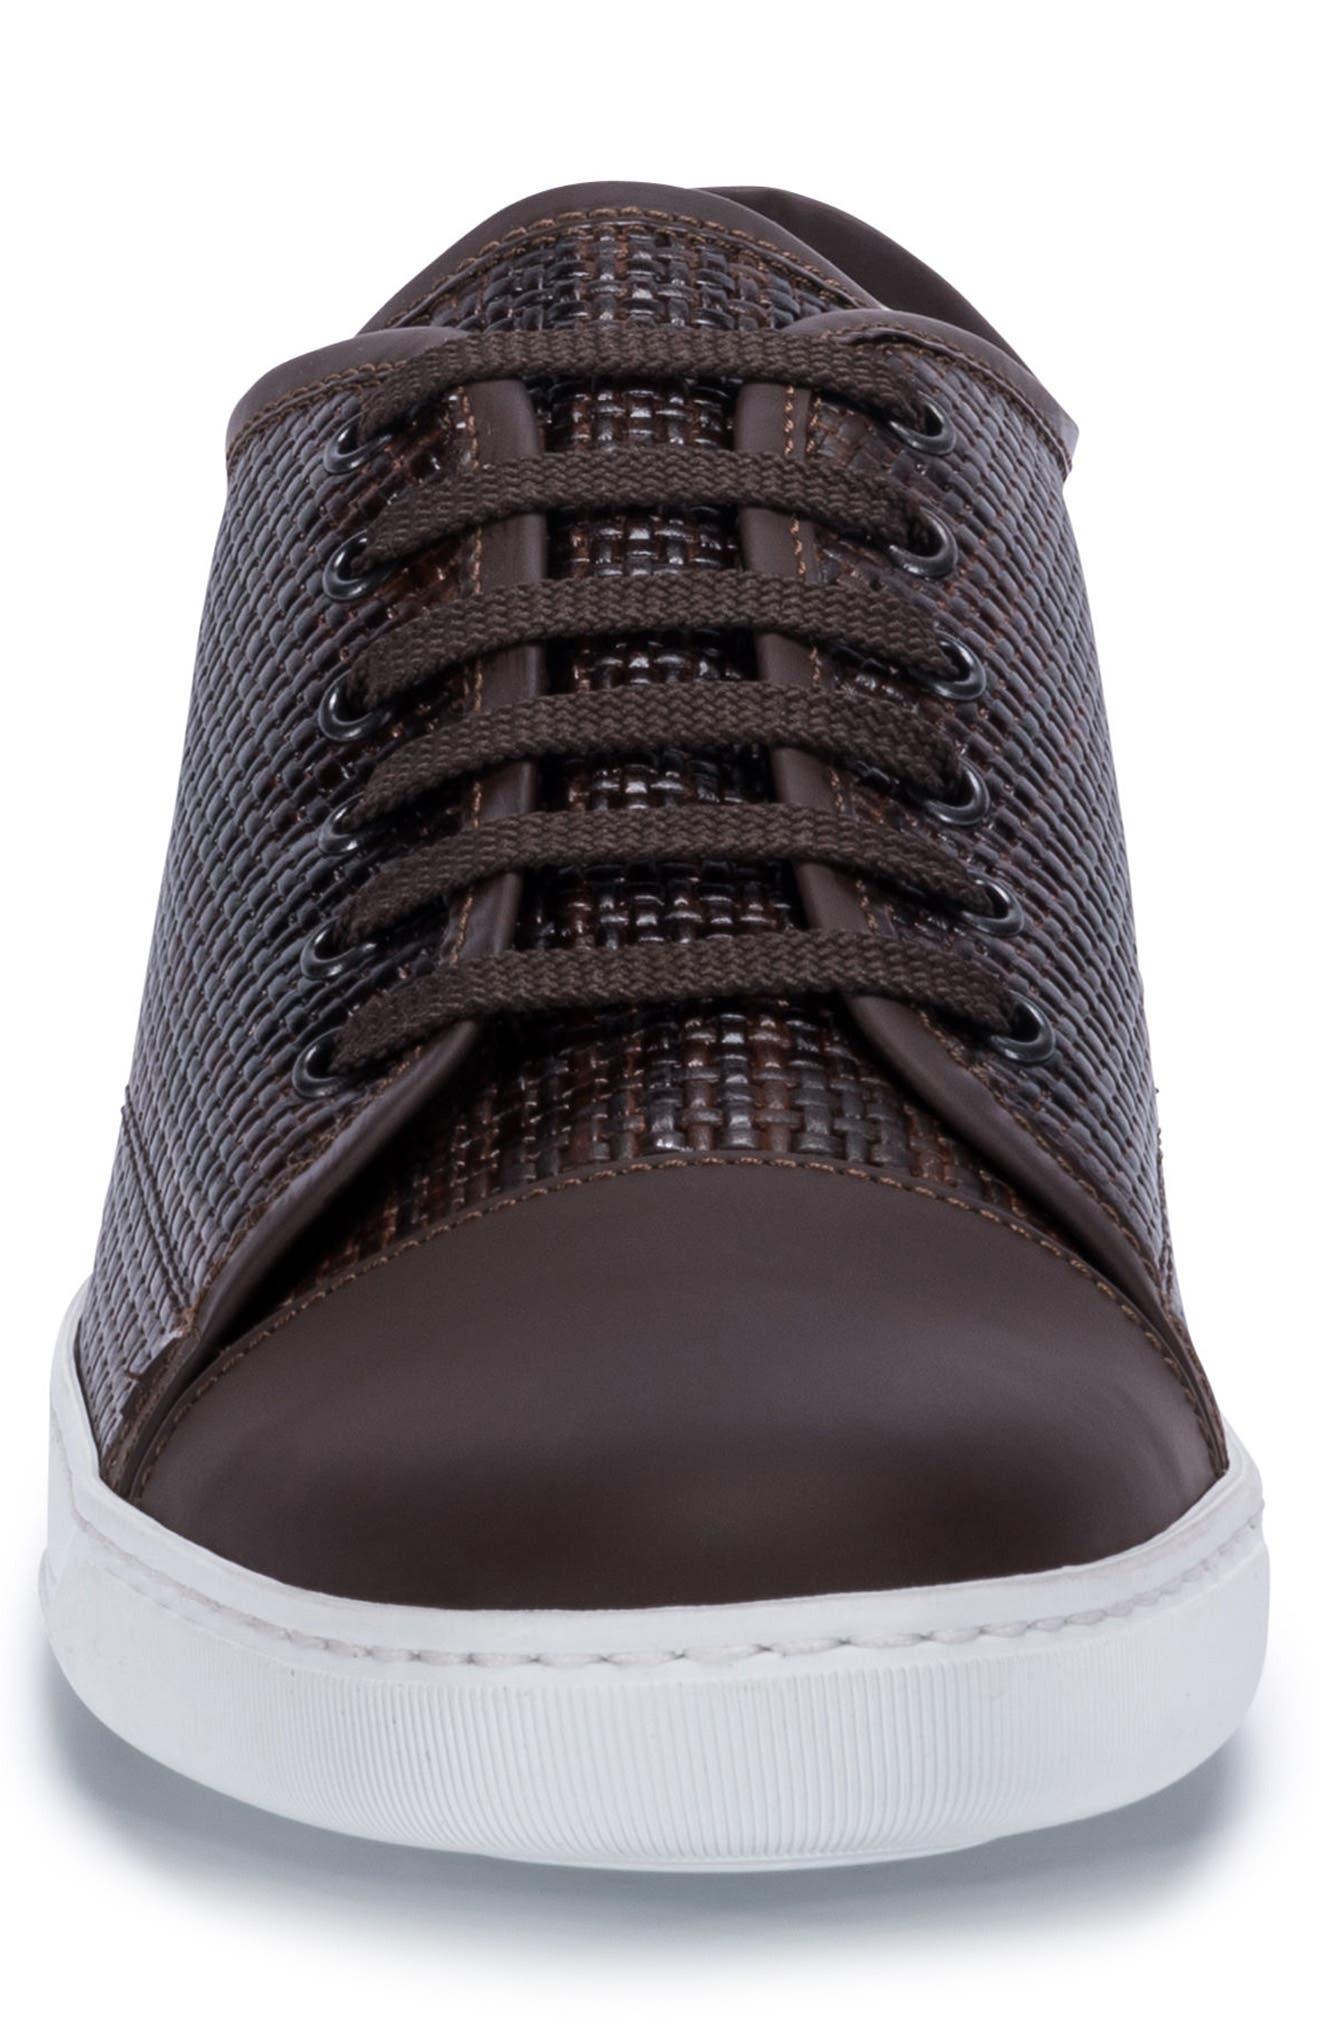 Cinque Terre Woven Cap Toe Sneaker,                             Alternate thumbnail 4, color,                             Brown Leather